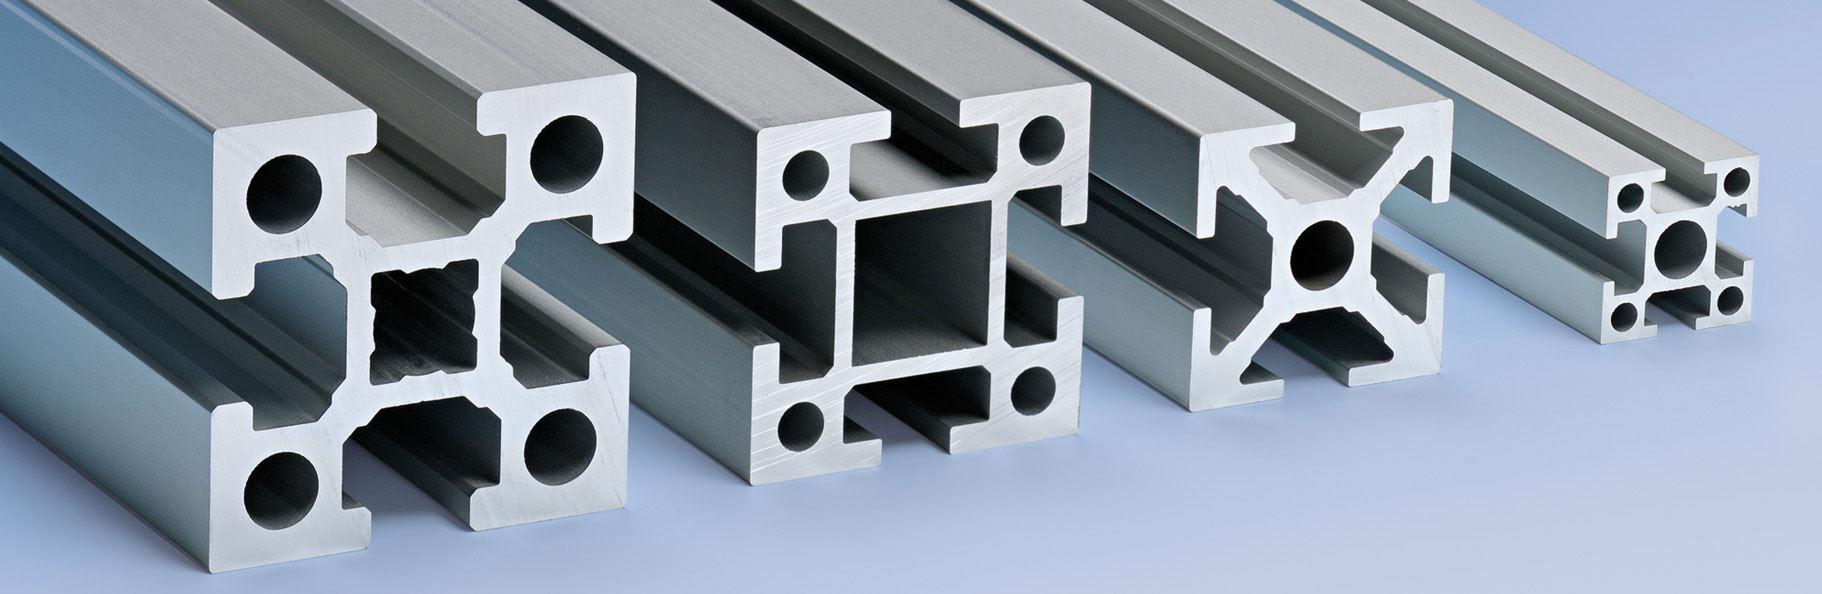 Conveyor Manufacturer | Conveyors, Pallet Systems, Extruded Aluminum ...